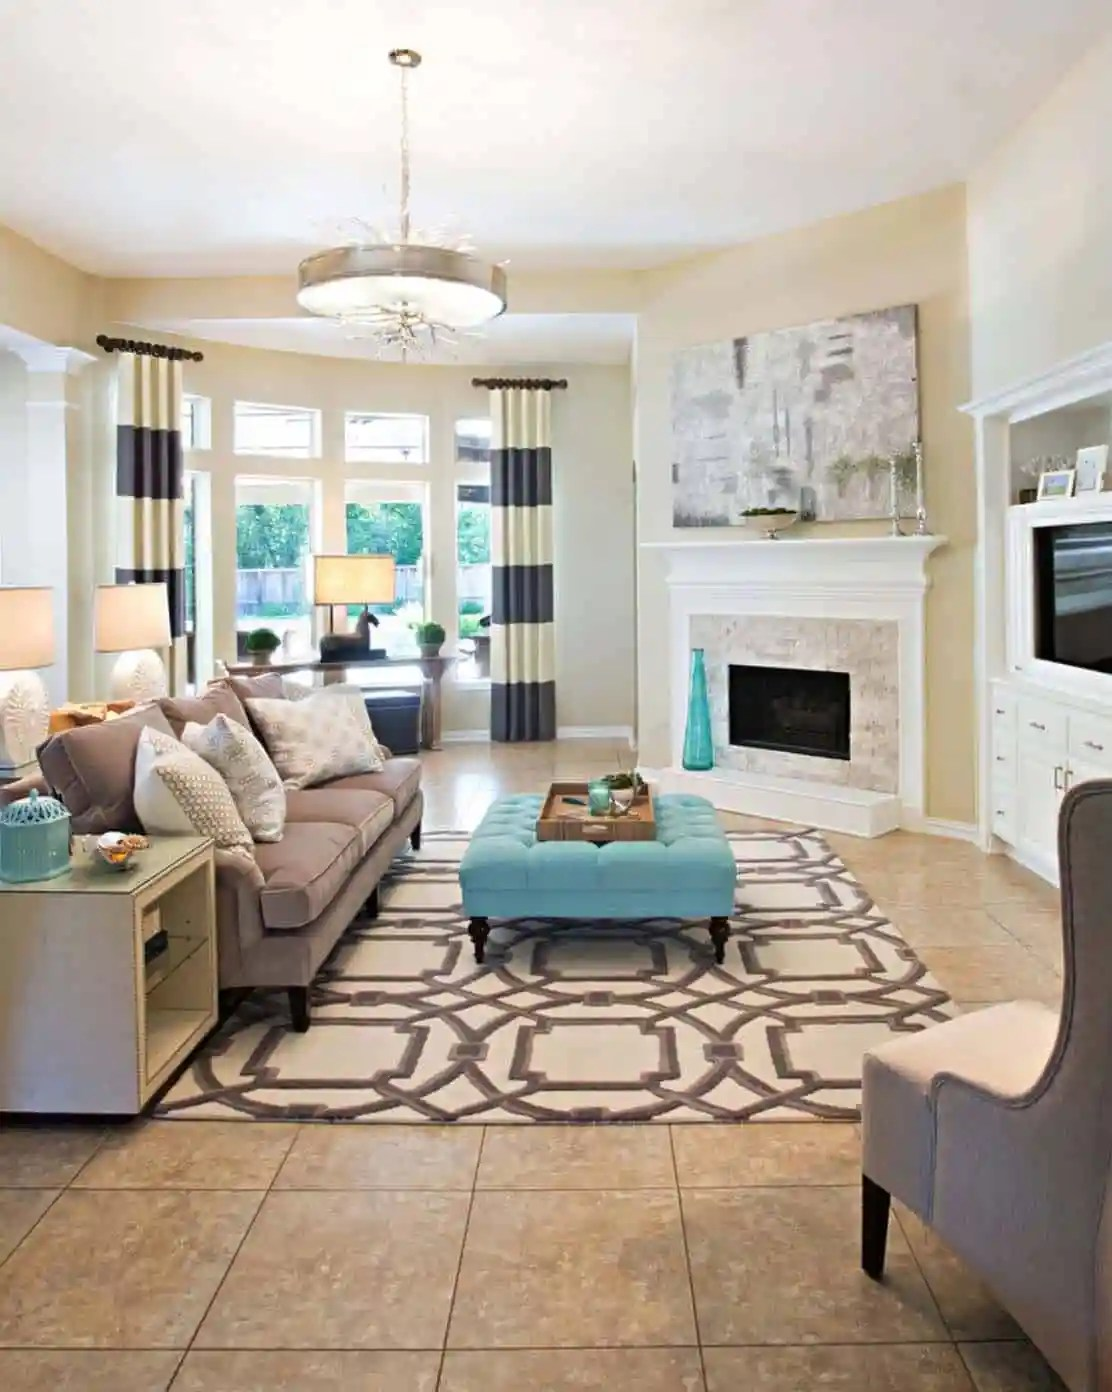 Image Result For Open Plan Kitchen Living Room Design Ideasa